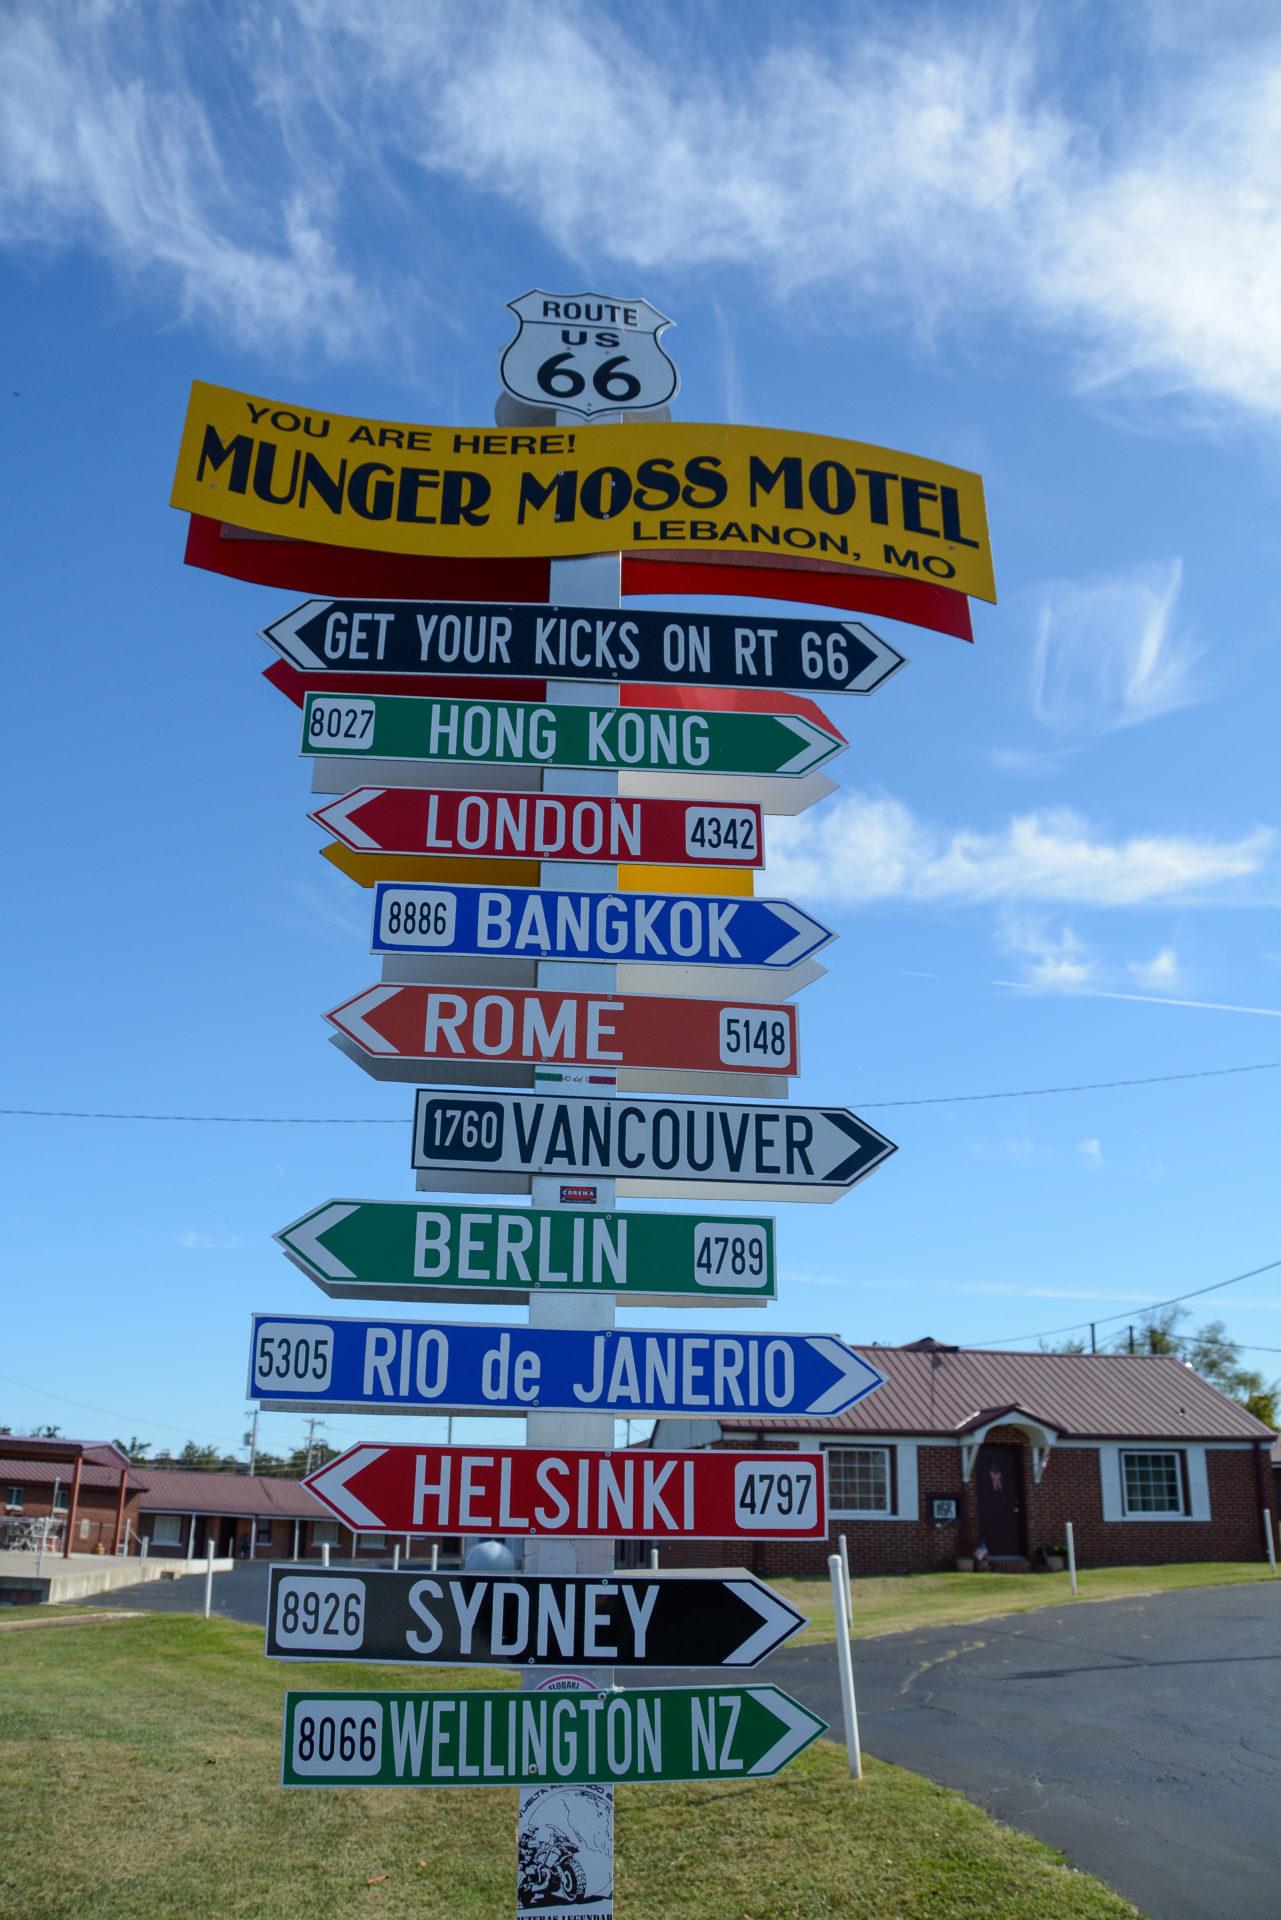 Kilometercharts Schild beim Munger Moss Motel in Cuba, Missouri